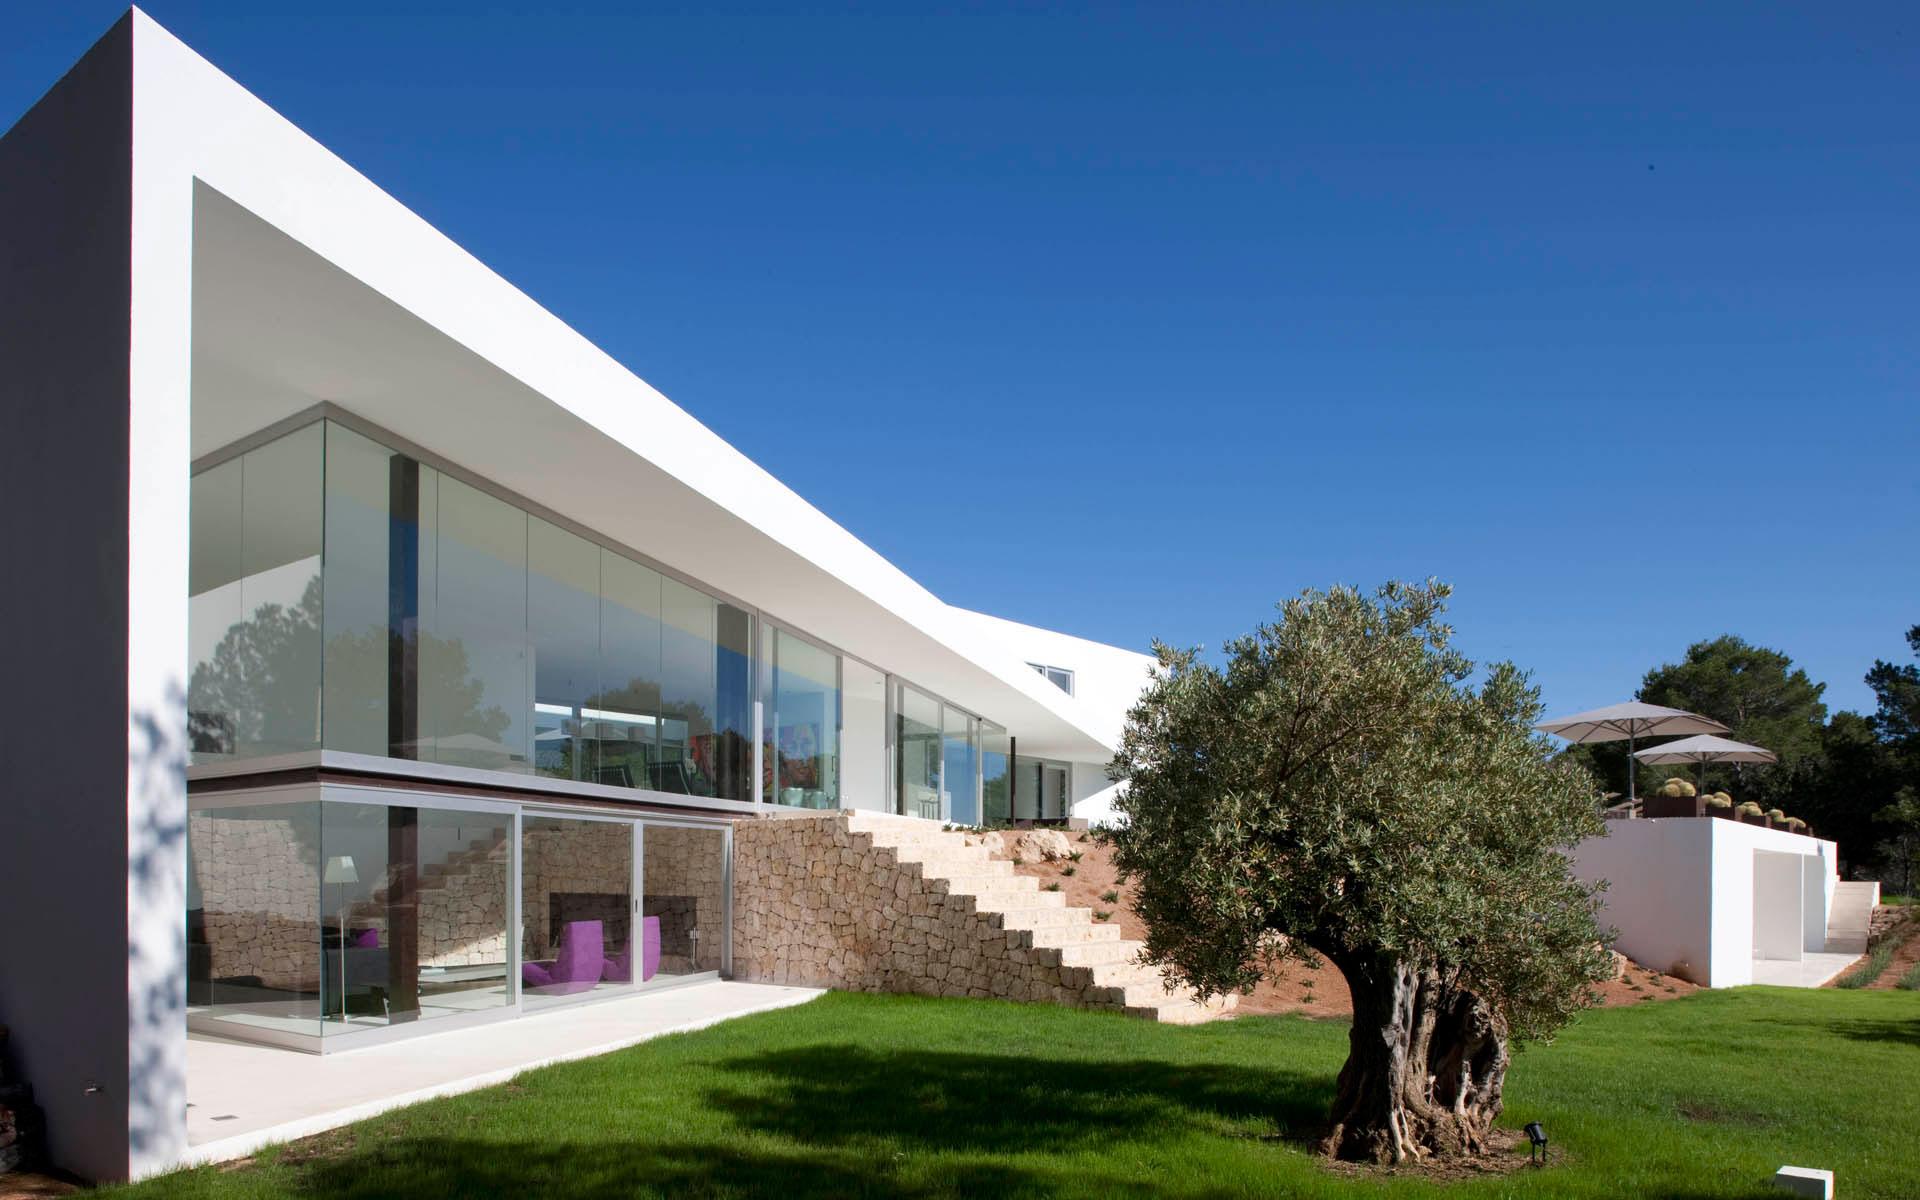 Mediterranean villa ixos in ibiza caandesign for Mediterranean villa design